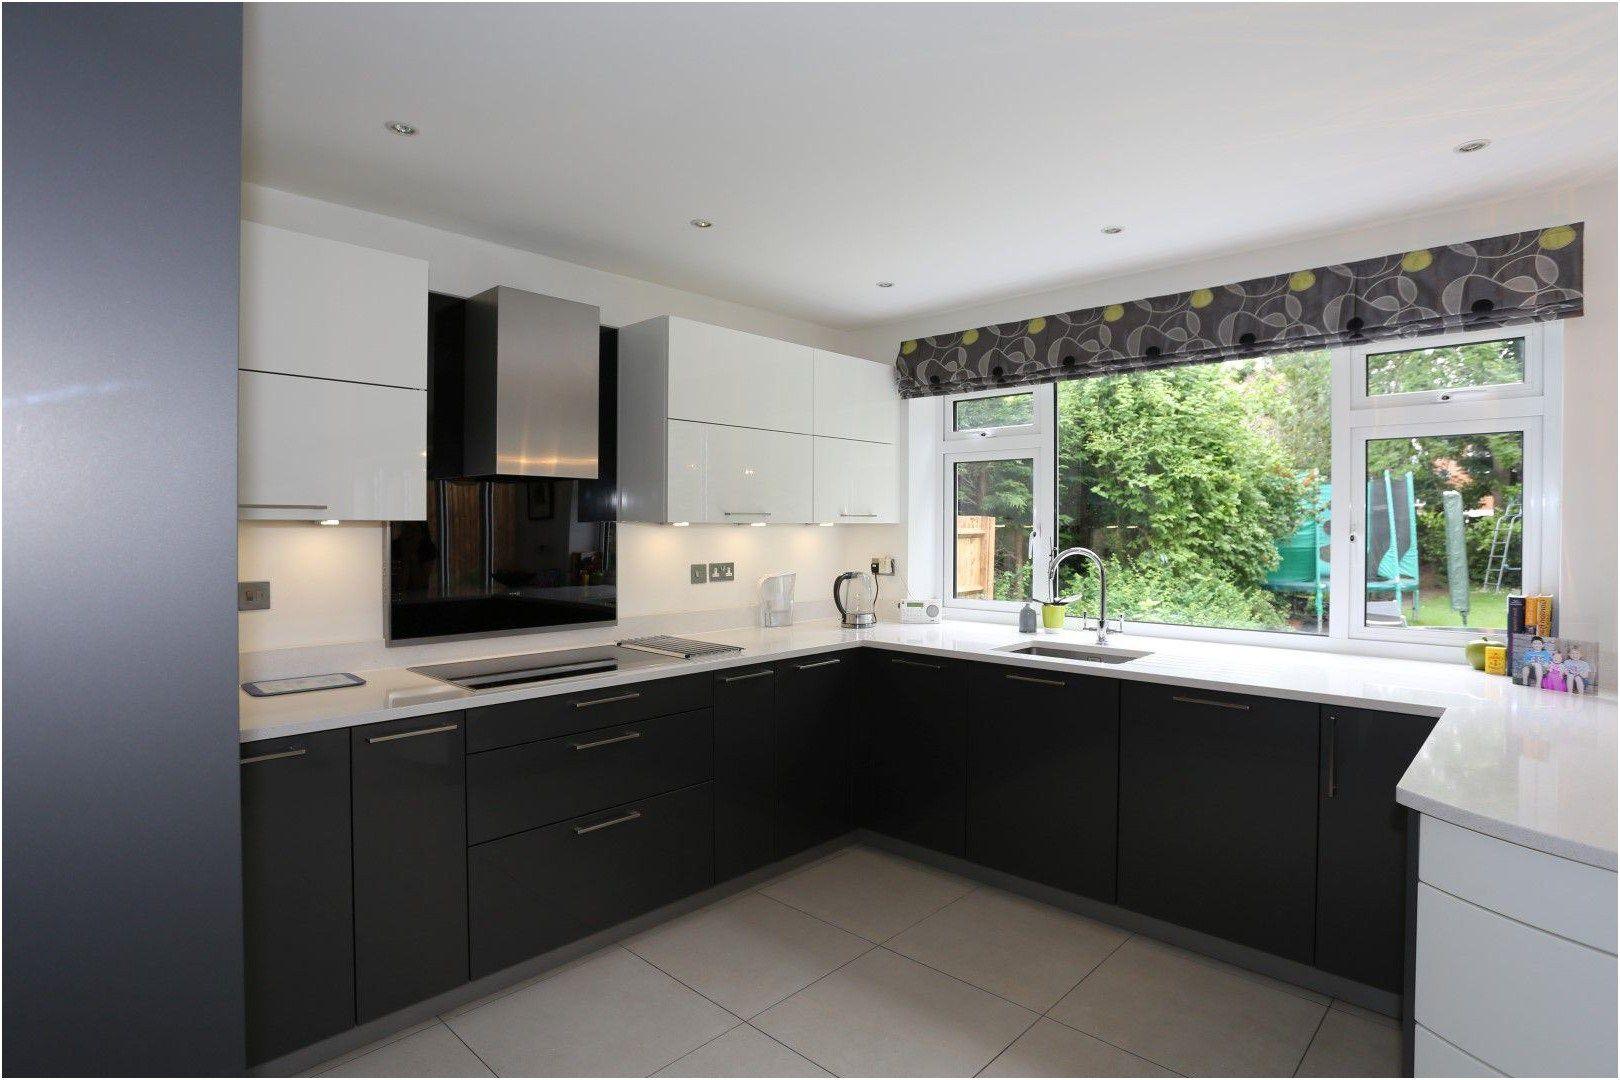 Kitchen Designs Cabinet Paint Homebase Gray Kitchen Sets From Homebase Kitchen Accessories